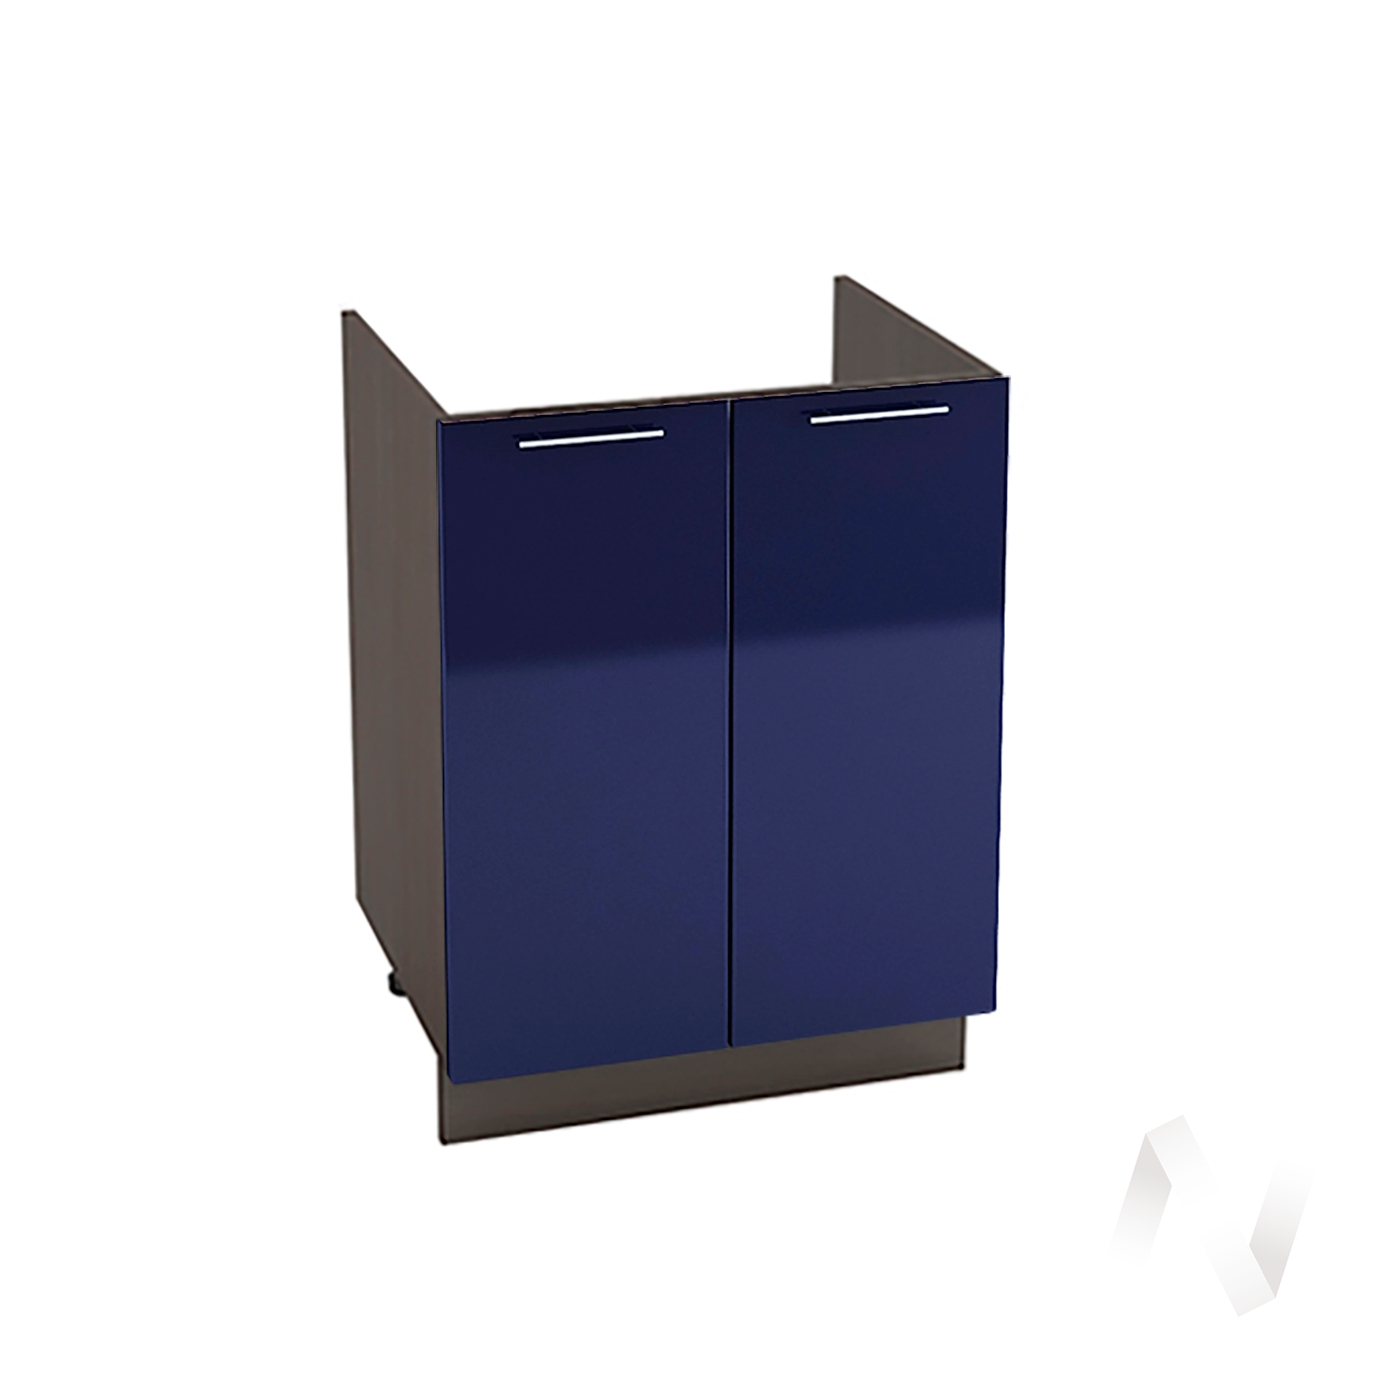 "Кухня ""Валерия-М"": Шкаф нижний под мойку 600, ШНМ 600 новый (Синий глянец/корпус венге)"